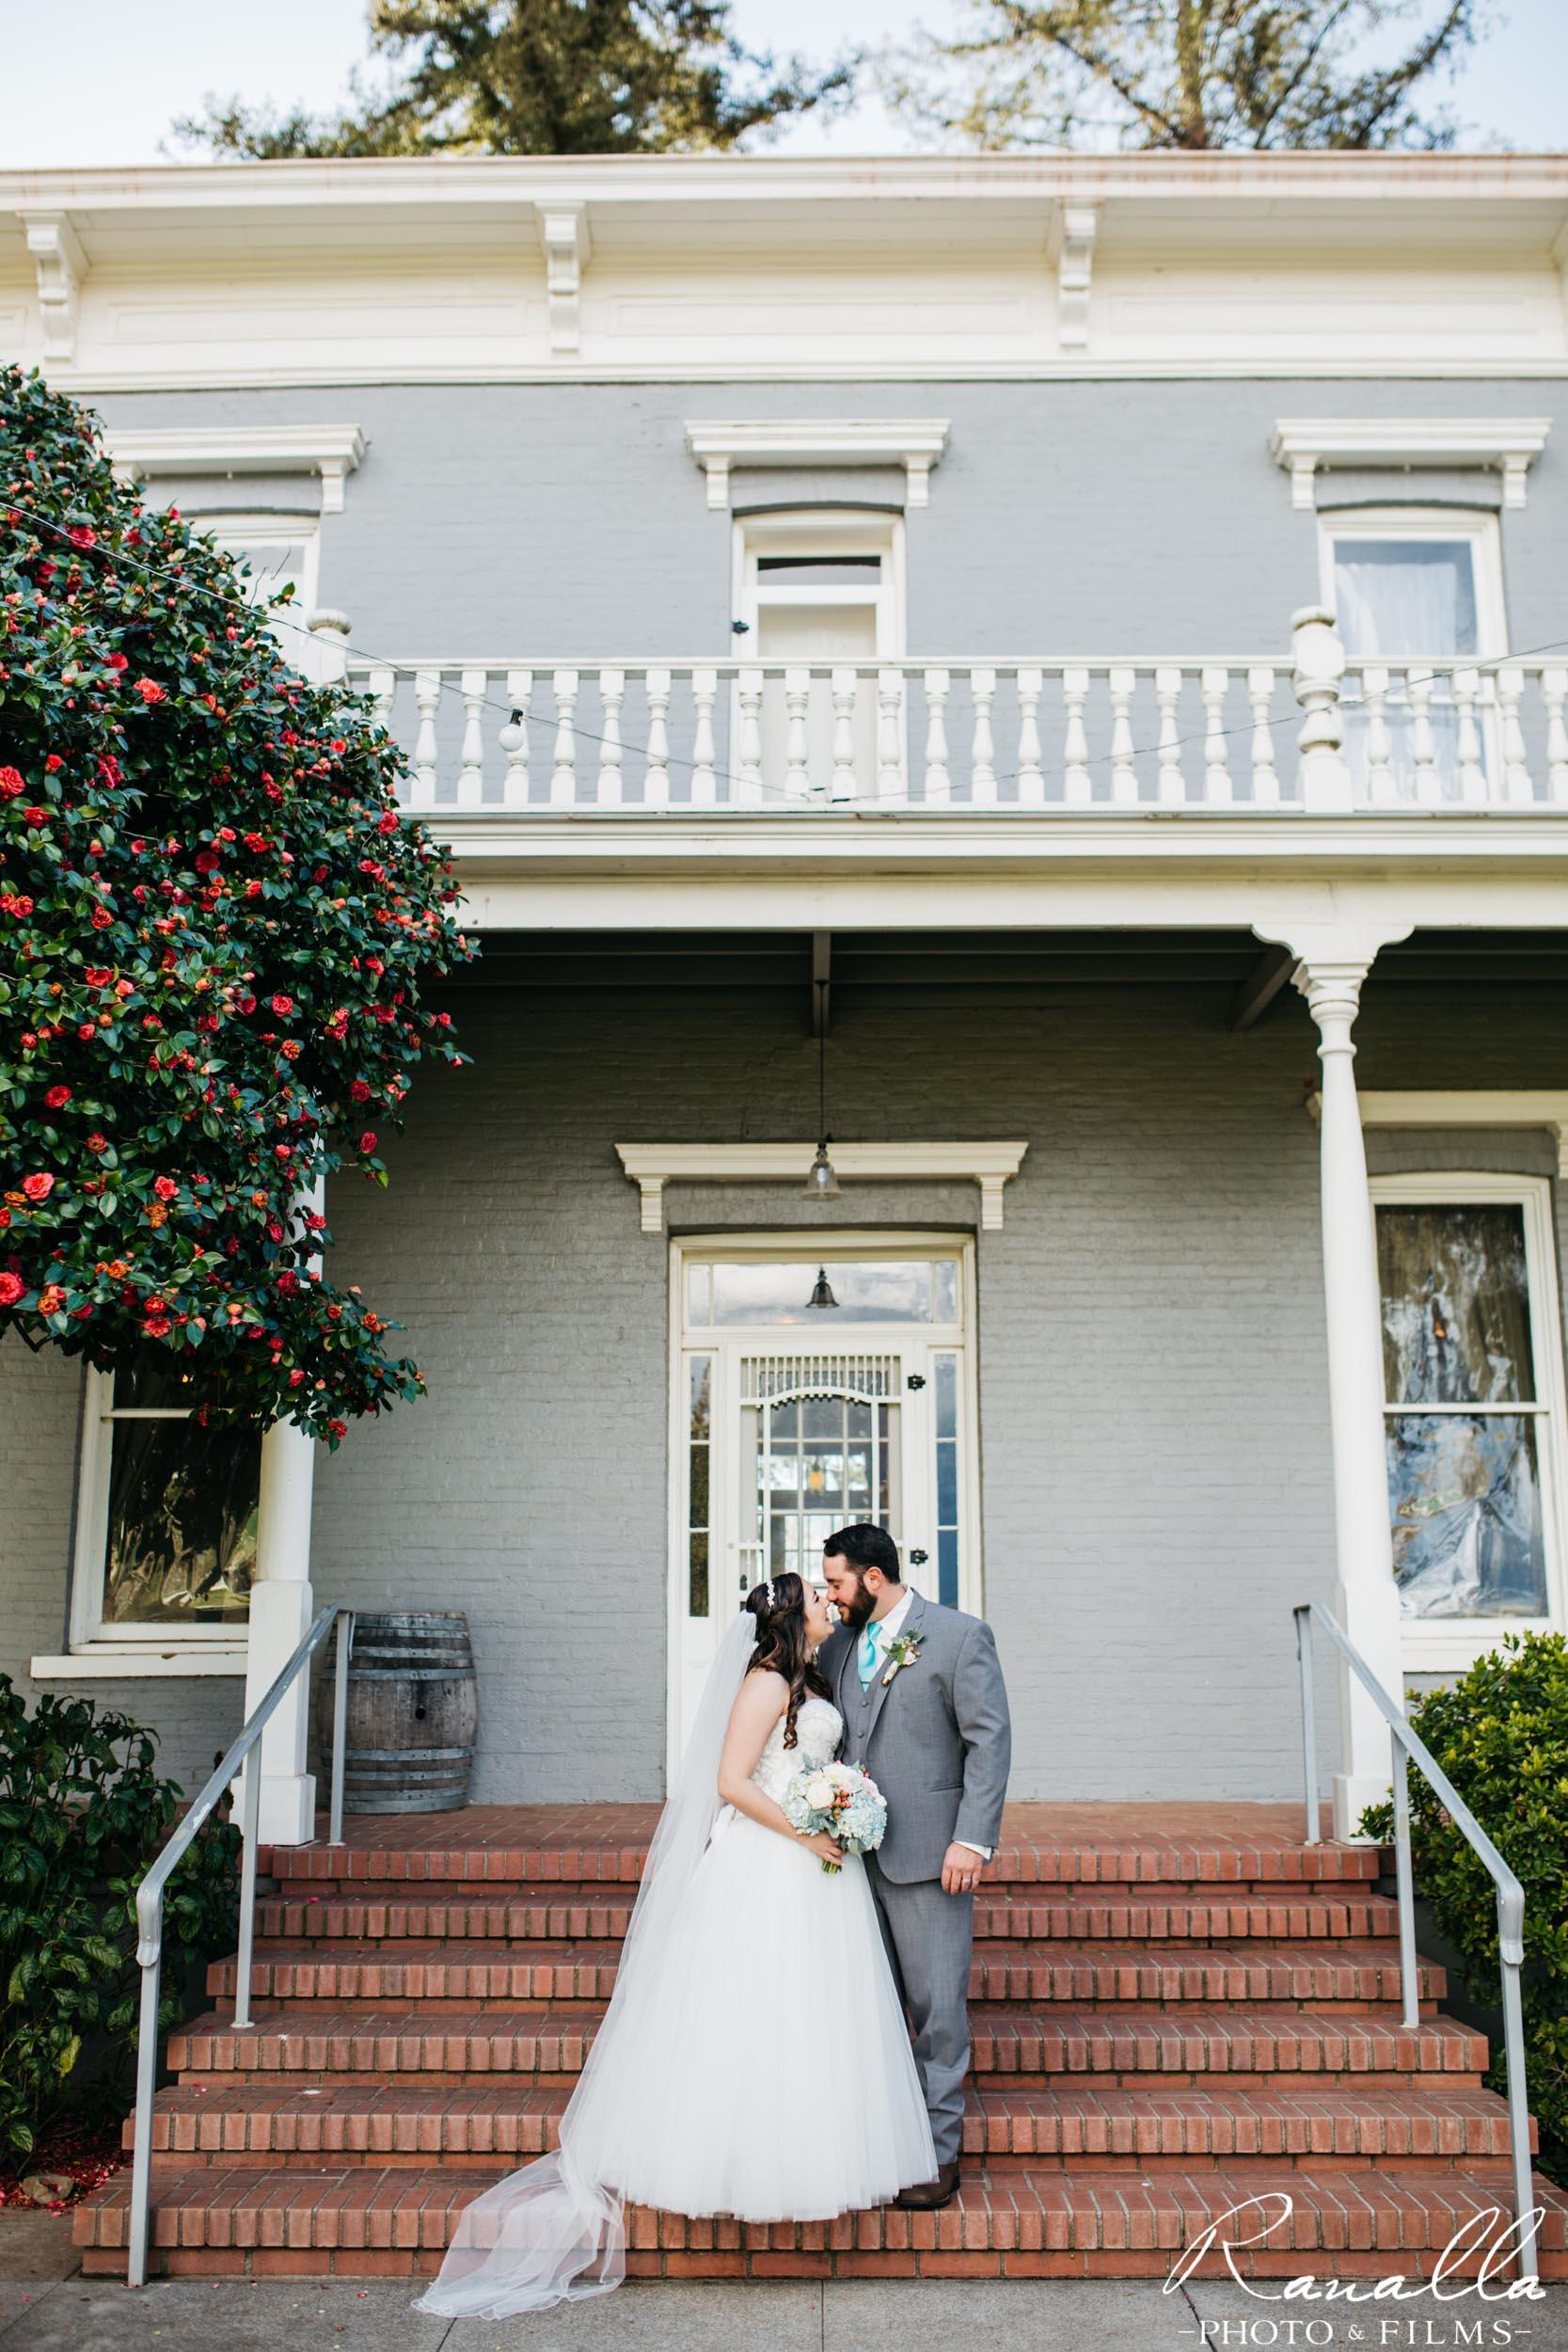 Chico Wedding Photography- Bride & Groom on Brick Steps- Patrick Ranch Wedding Photos- Ranalla Photo & Films